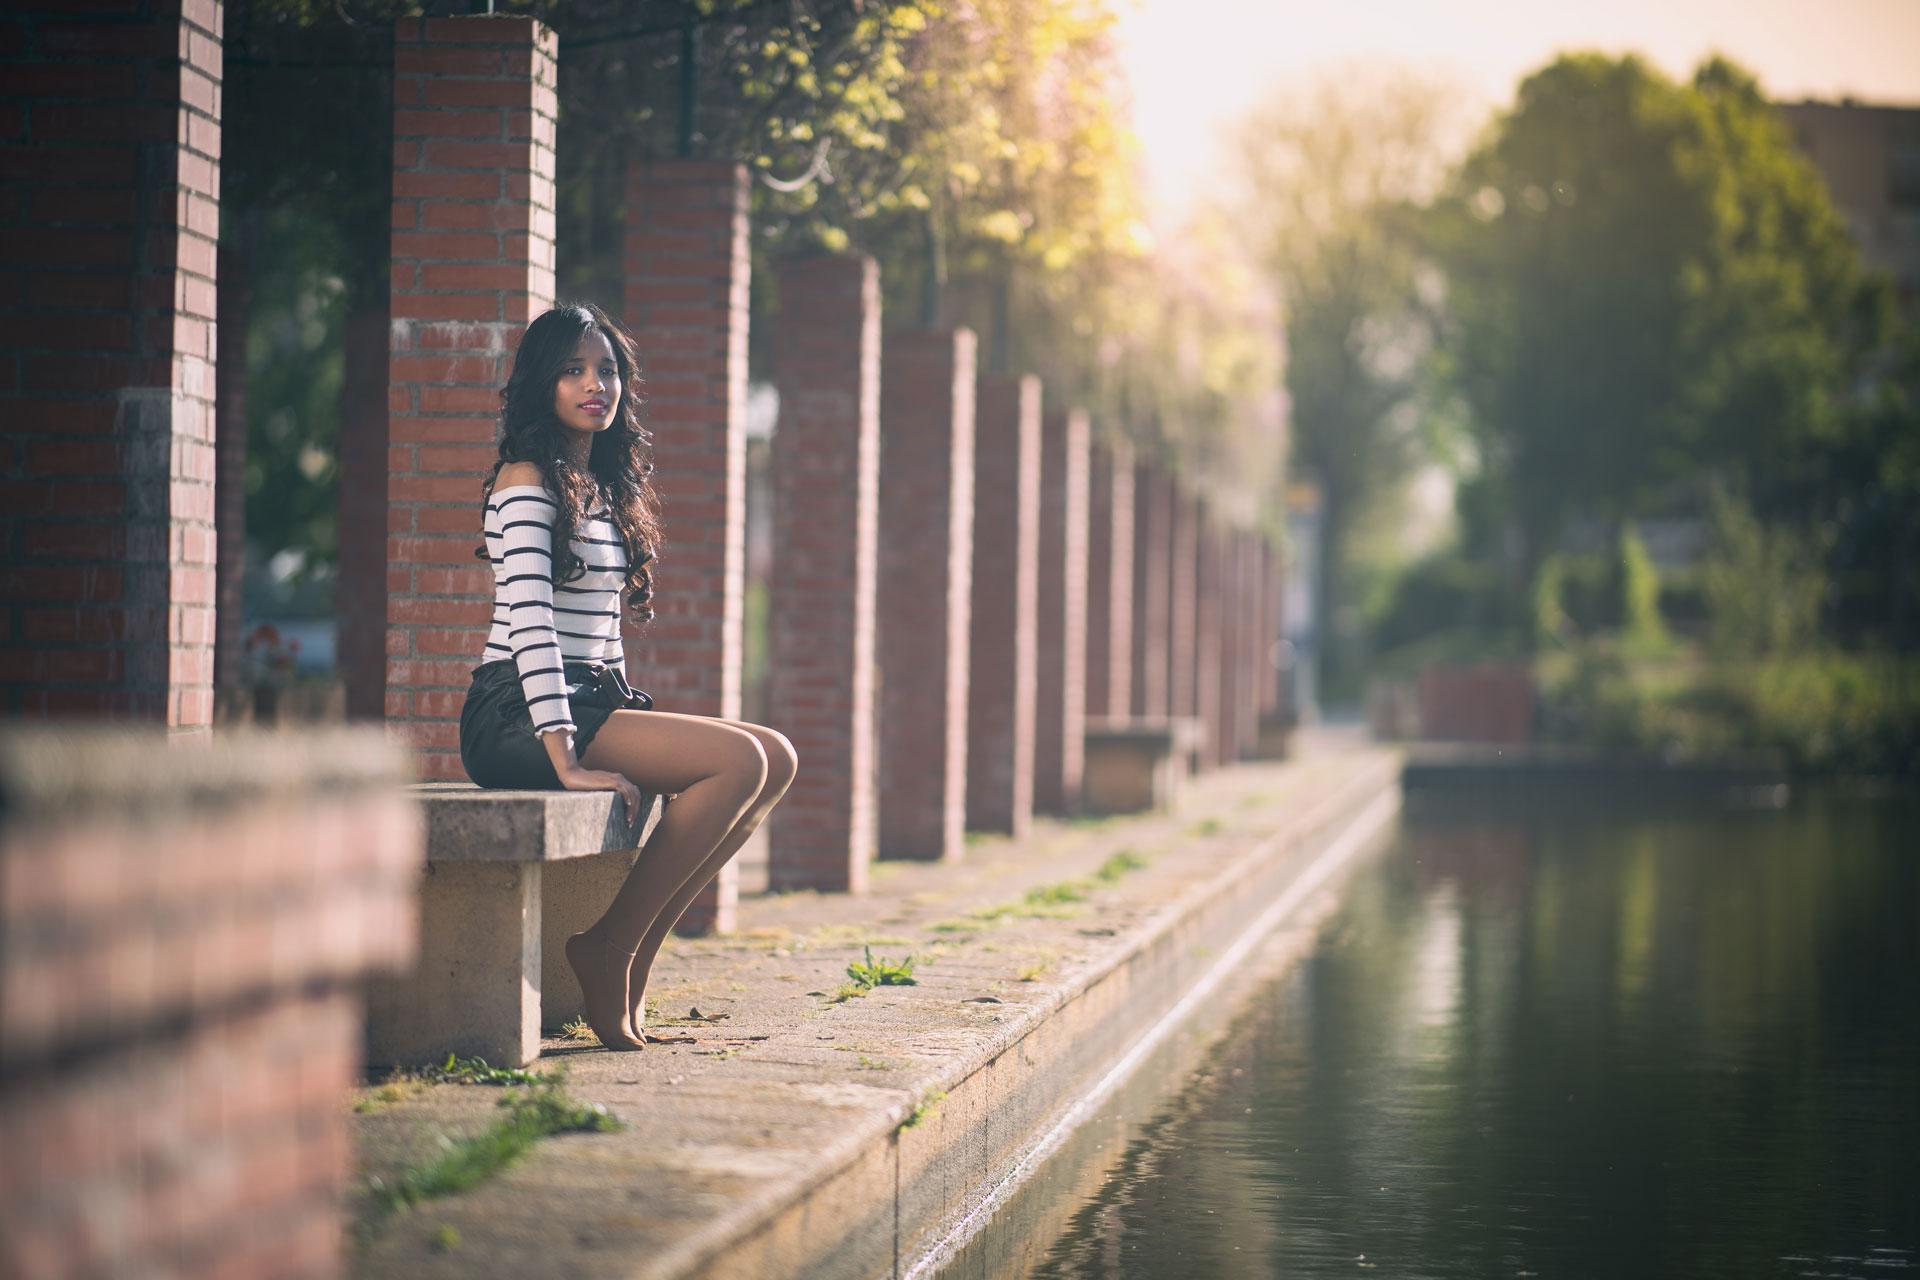 Photo Majda